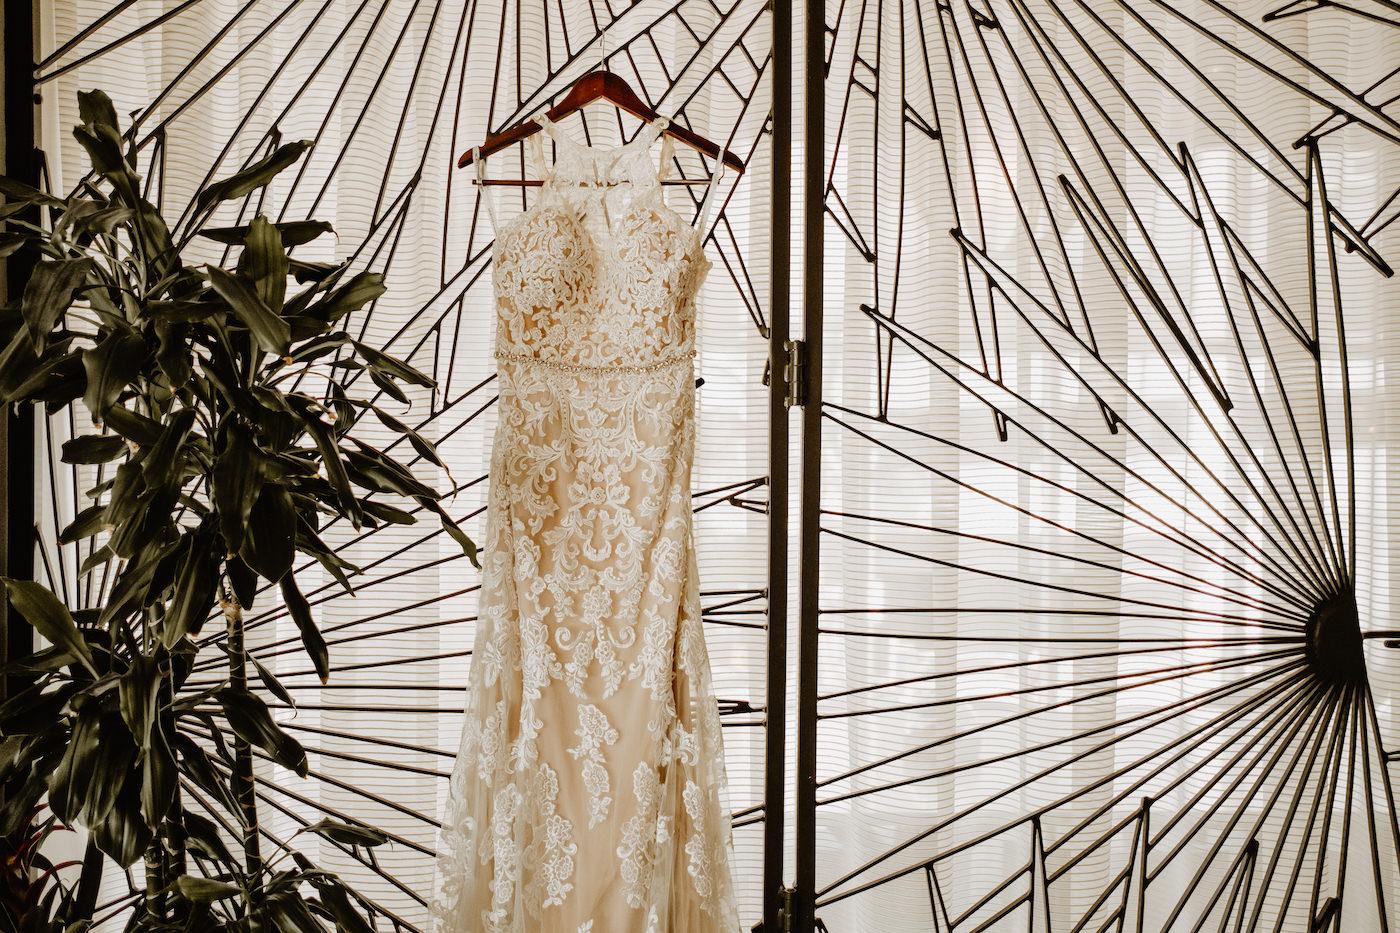 Wedding Dress Hanger Shot   Champagne Lace Sheath Illusion Neck Bridal Gown